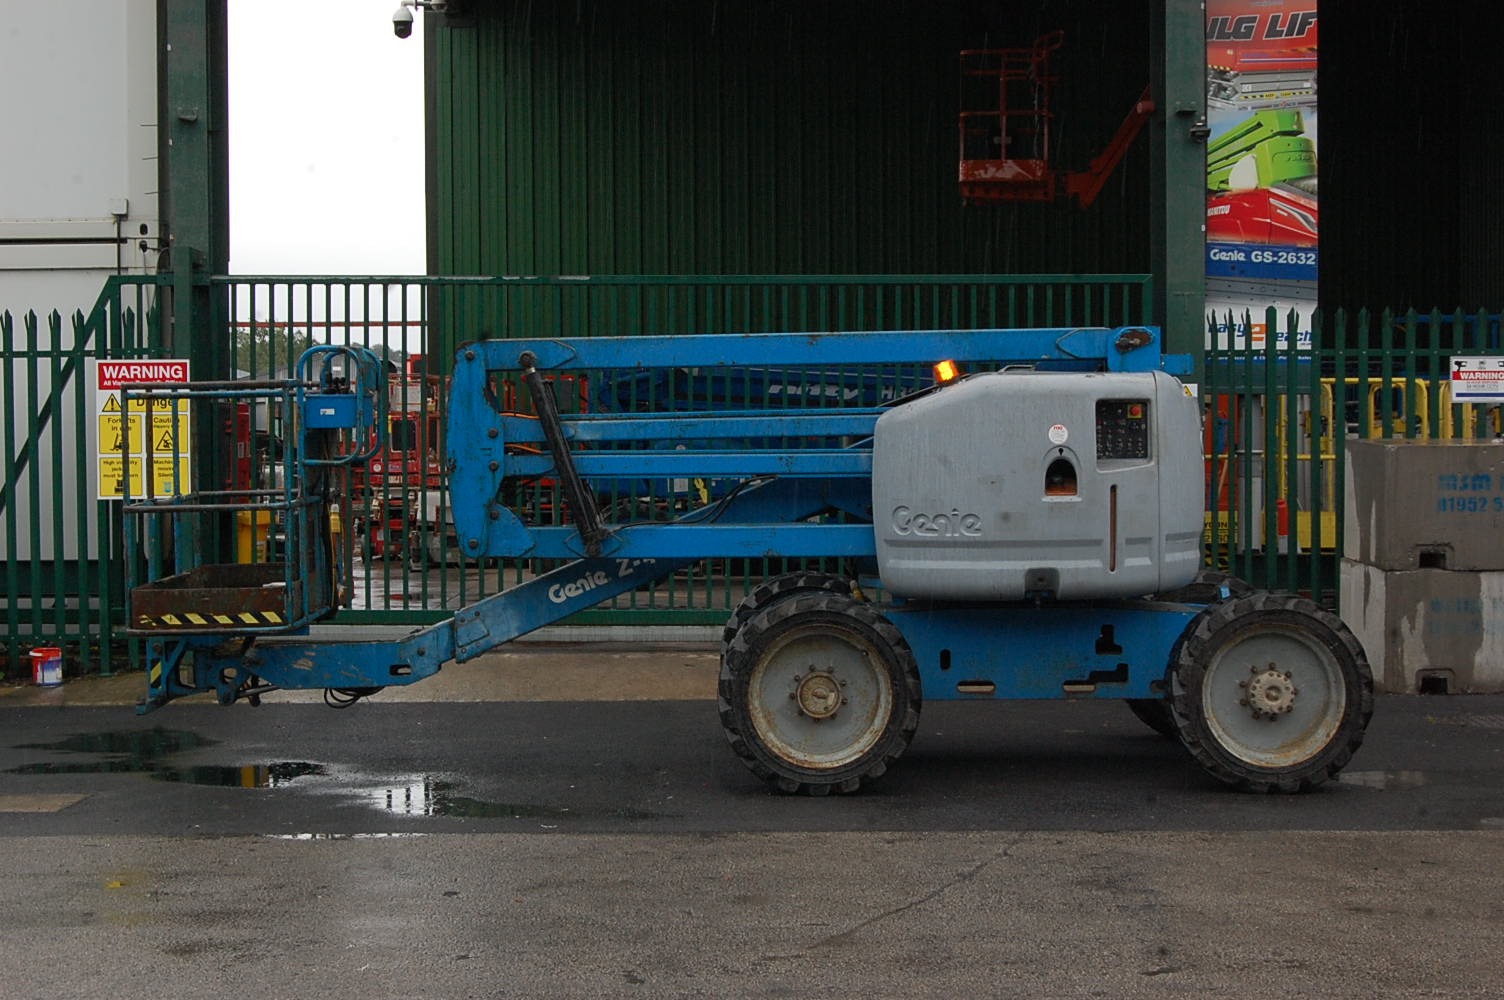 Genie Z45/25 Rough Terrain Diesel 16m Boom Lift